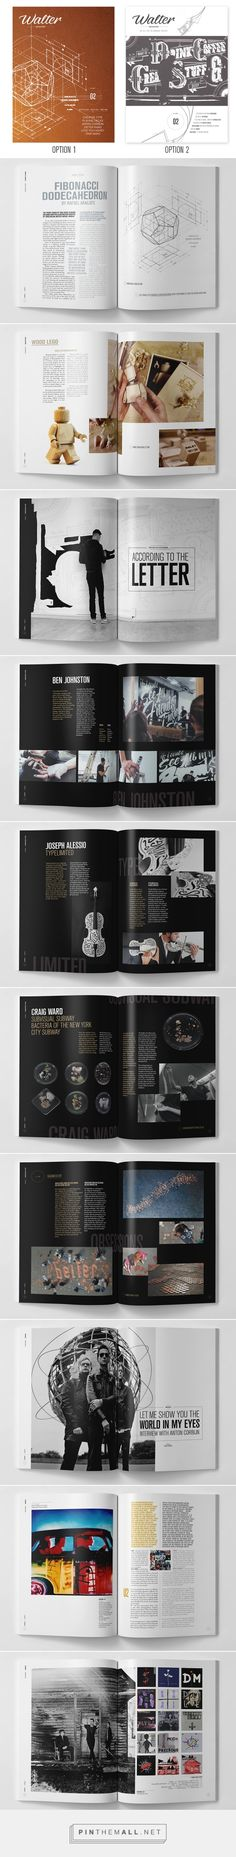 Walter Magazine 2